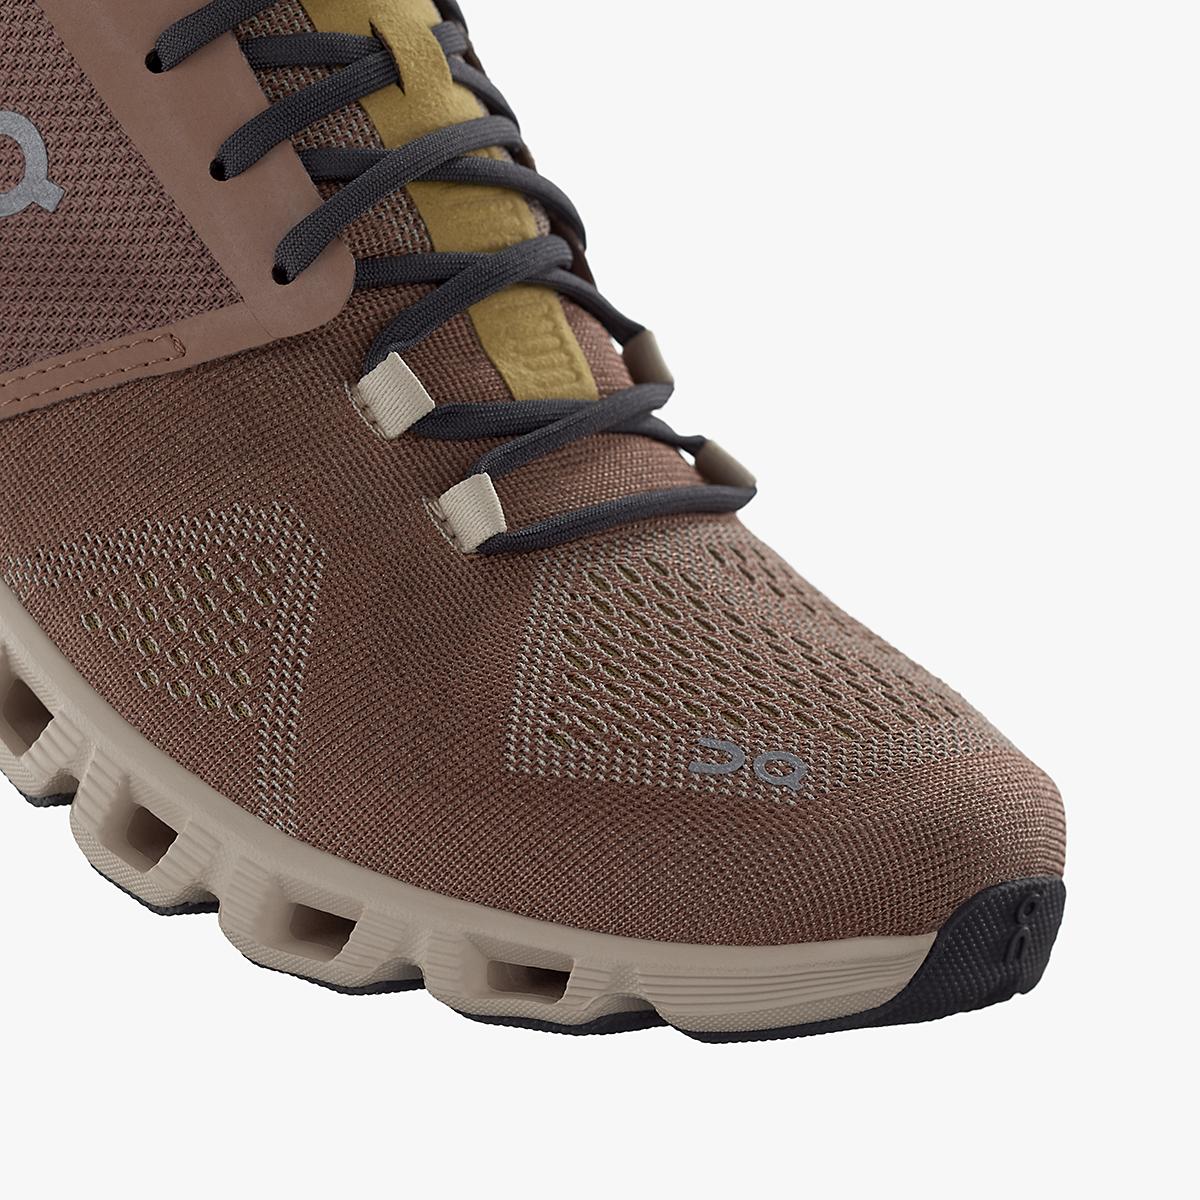 Women's On Cloud X 2.0 Training Shoe - Color: Mocha/Sand - Size: 5 - Width: Regular, Mocha/Sand, large, image 5